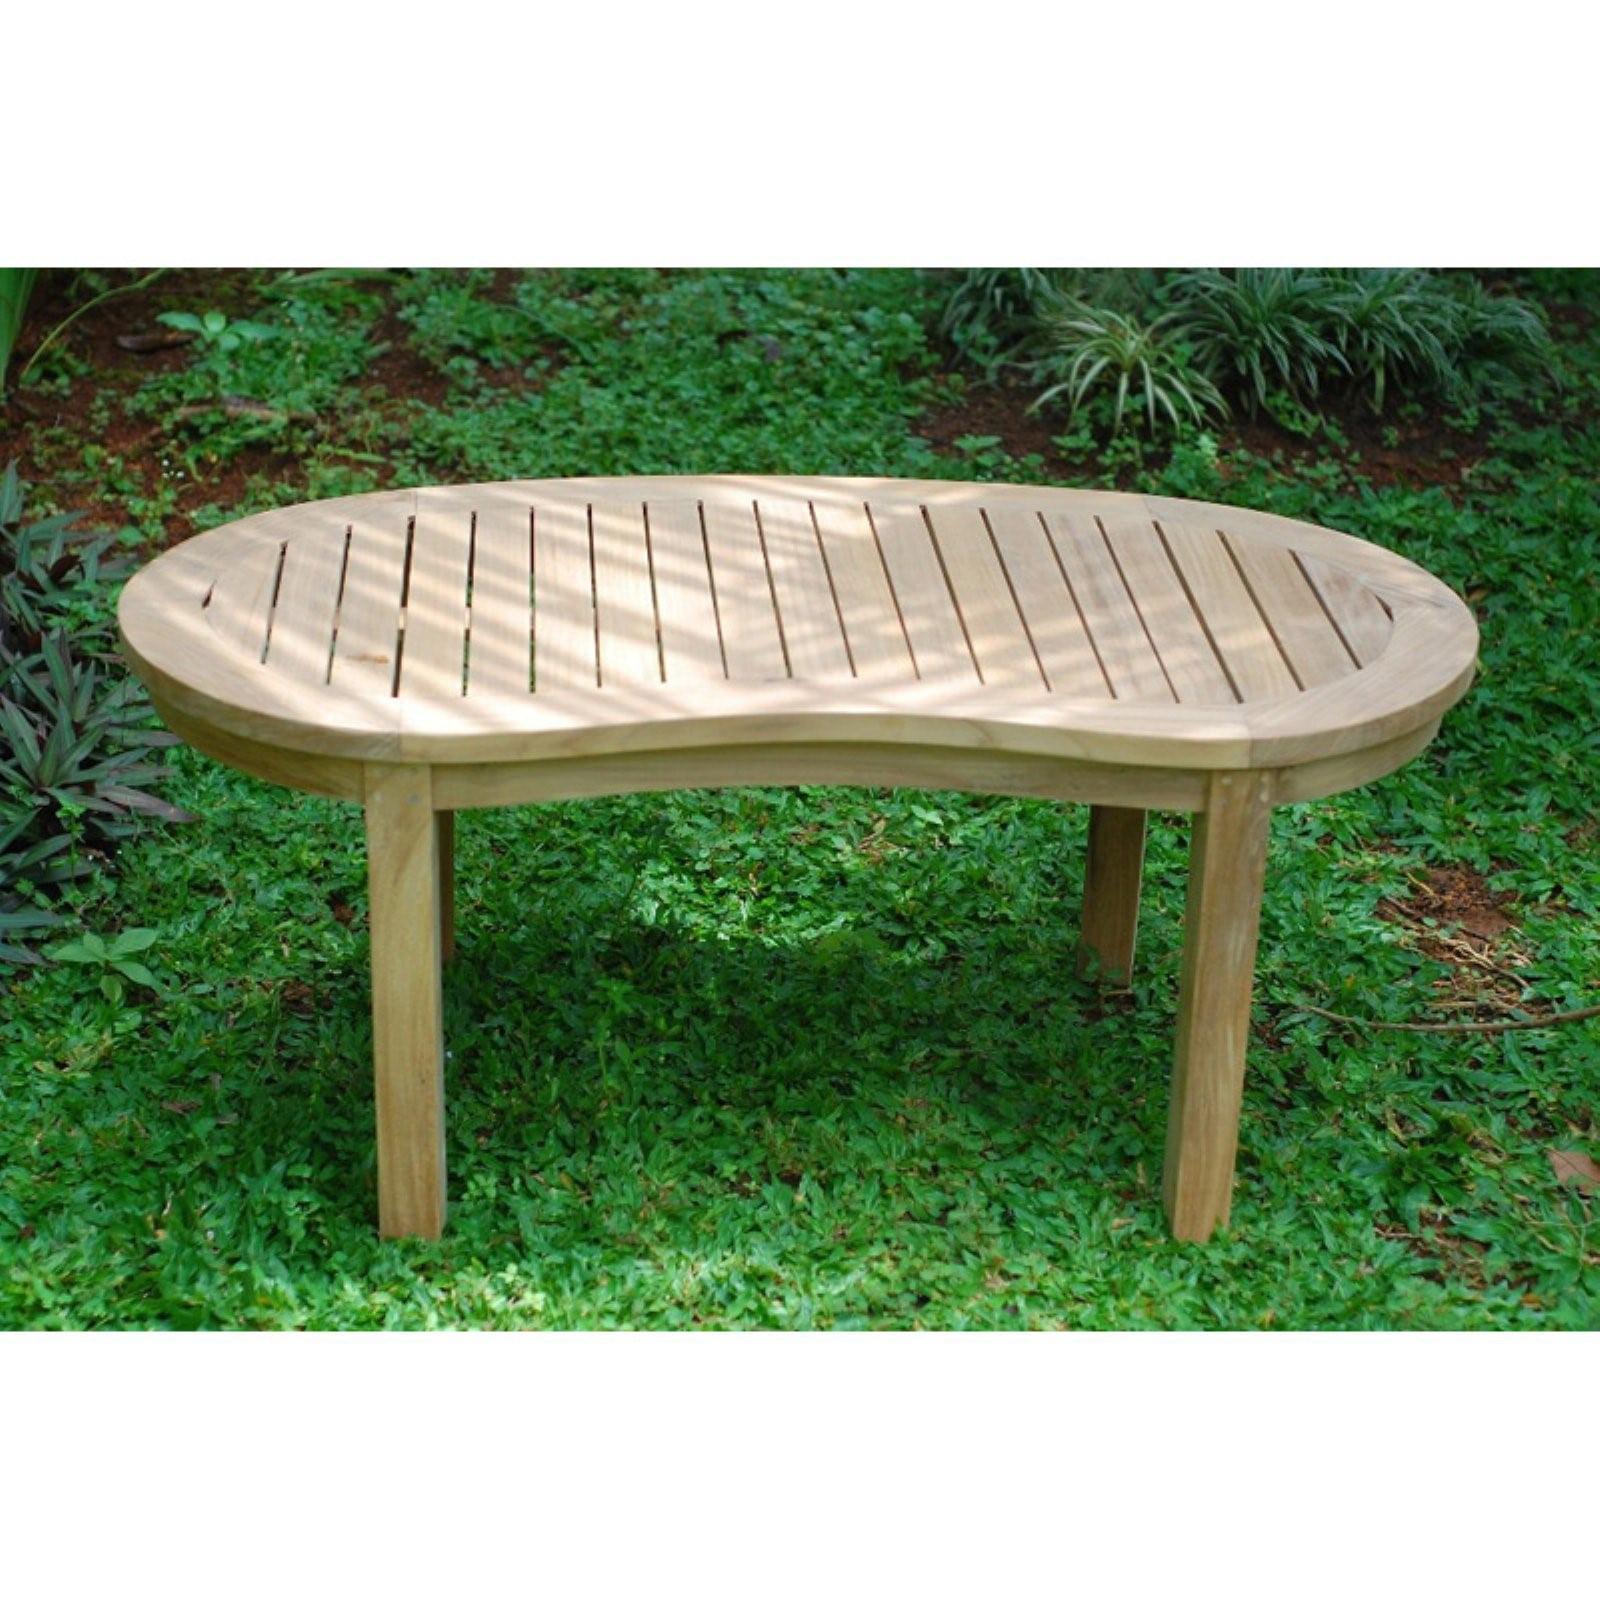 Windsor Teak Furniture Kensington Kidney Shaped Patio Coffee Table by Windsor Teak Furniture